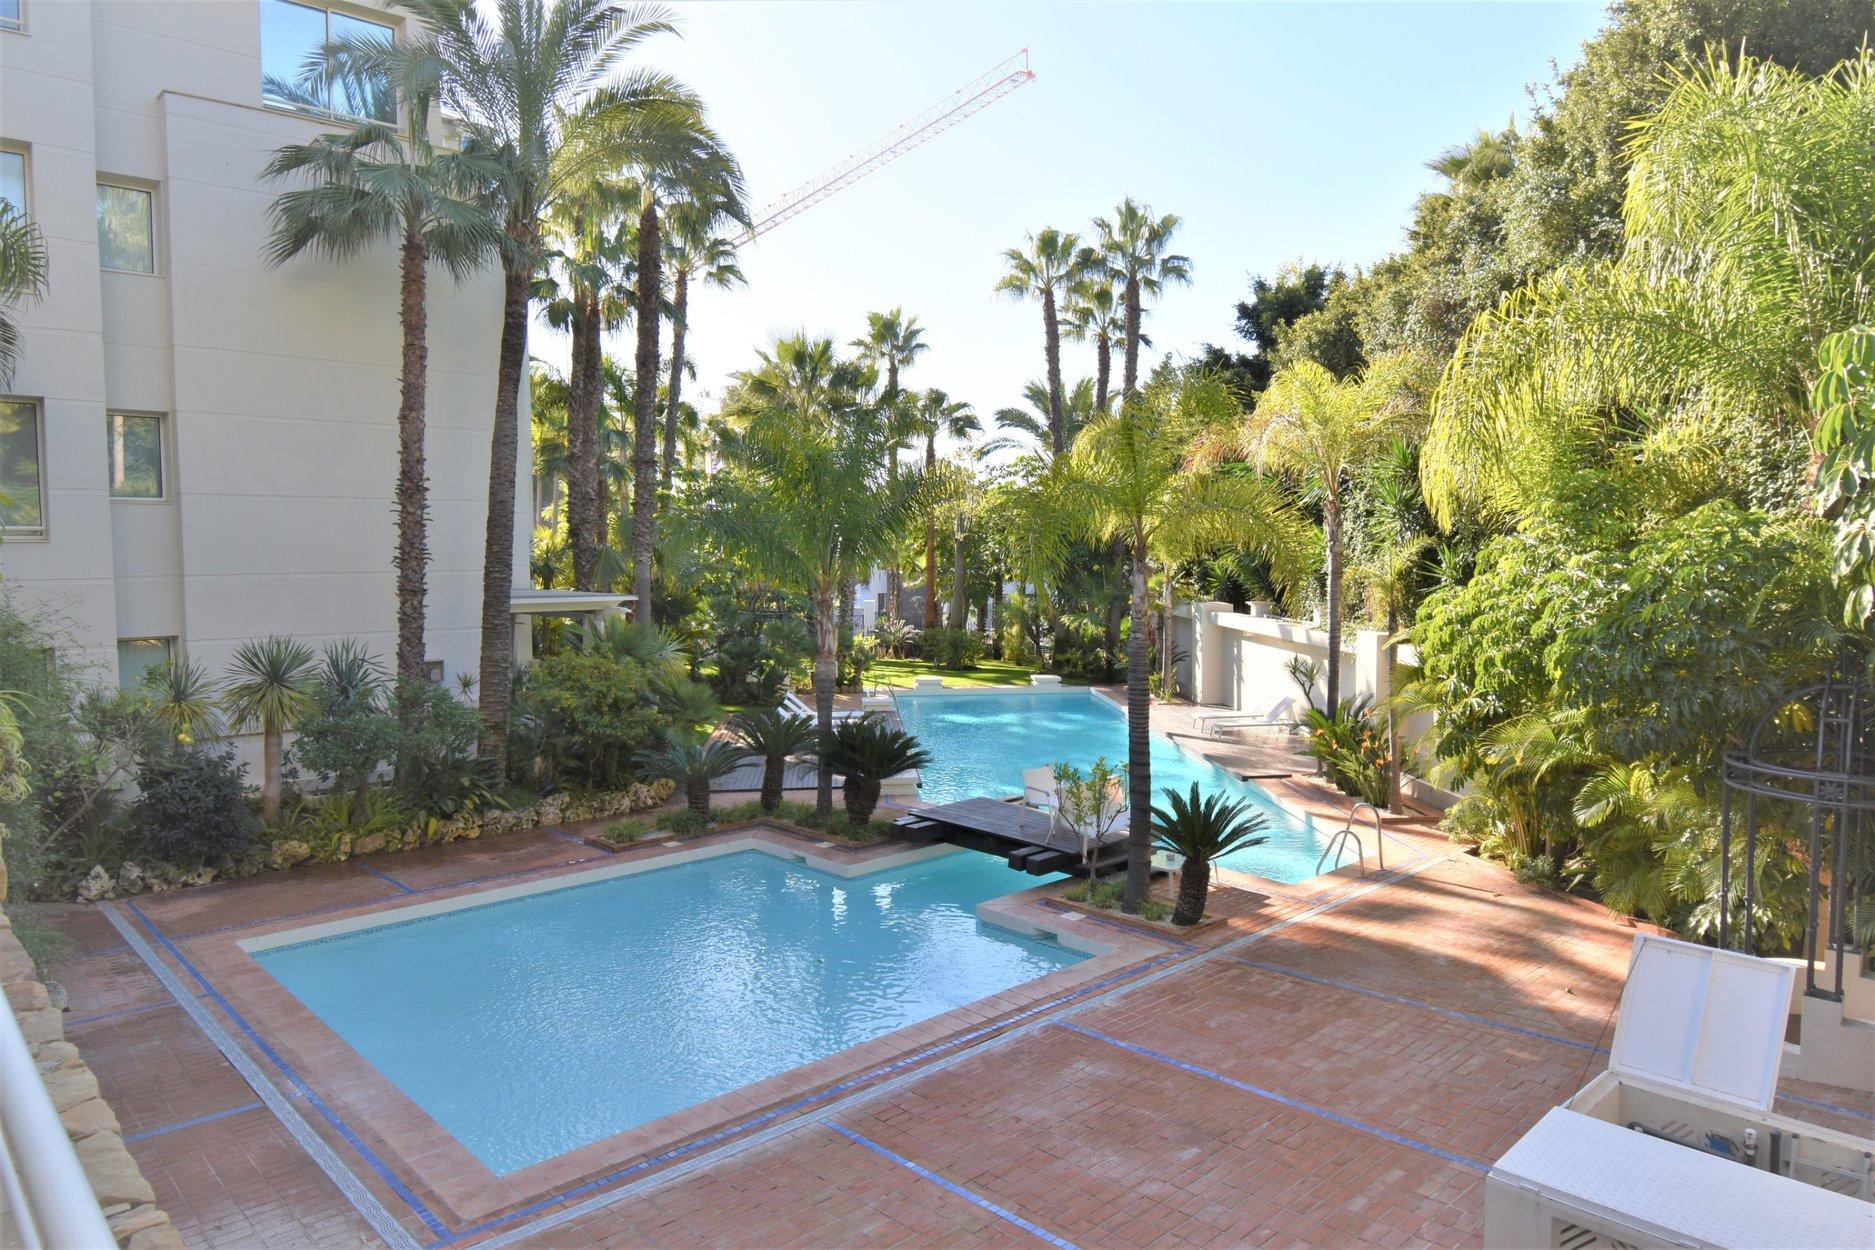 Apartment for sale in Marbella, Retiro de Nagüeles